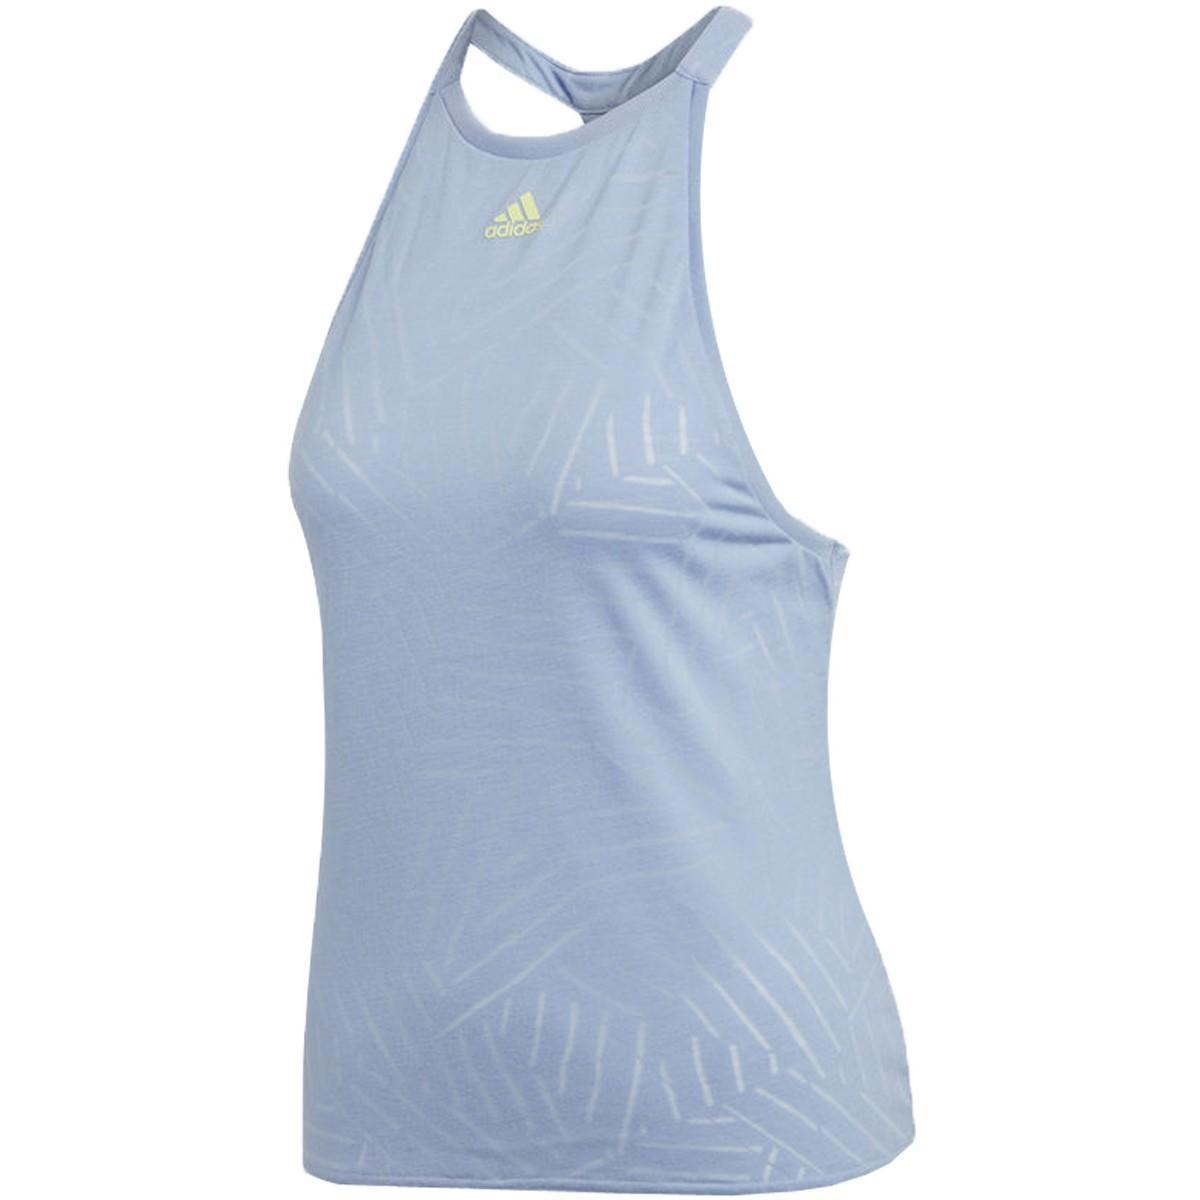 Теннисная майка женская Adidas Melbourne Burnout Tank light blue